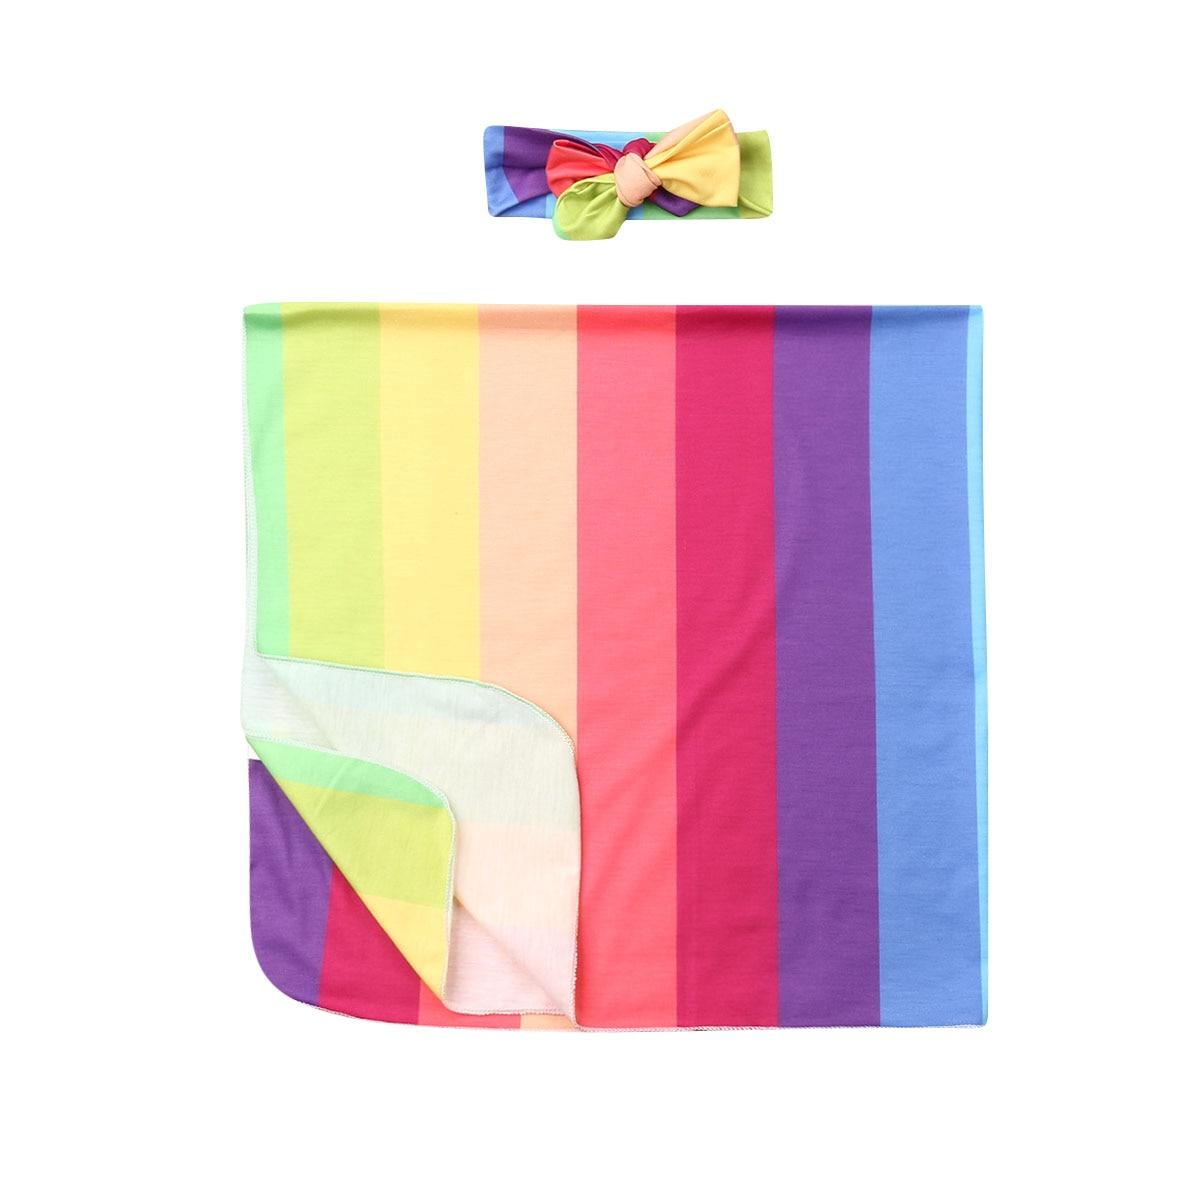 0-6M Infant Newborn Baby Girls Boys Rainbow Blanket Soft Warm Swaddling Wrap Sleeping Swaddle Baby Photography Props